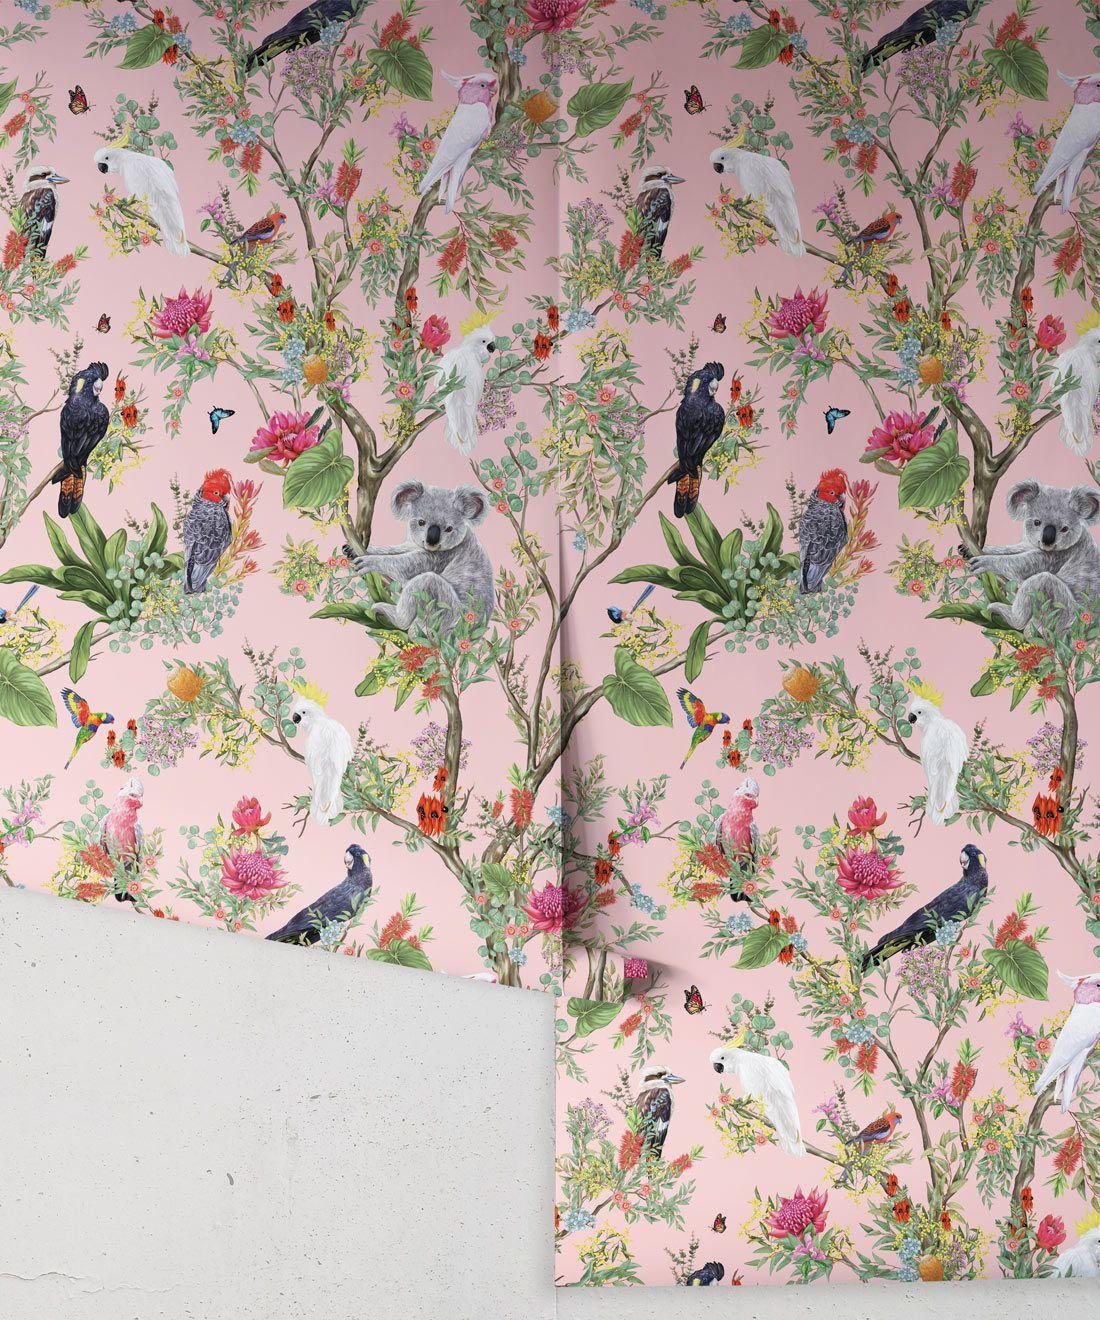 Australia Wallpaper • Cockatoos, Koalas, Parrots, Finches • Milton & King USA • Coral Wallpaper Roll